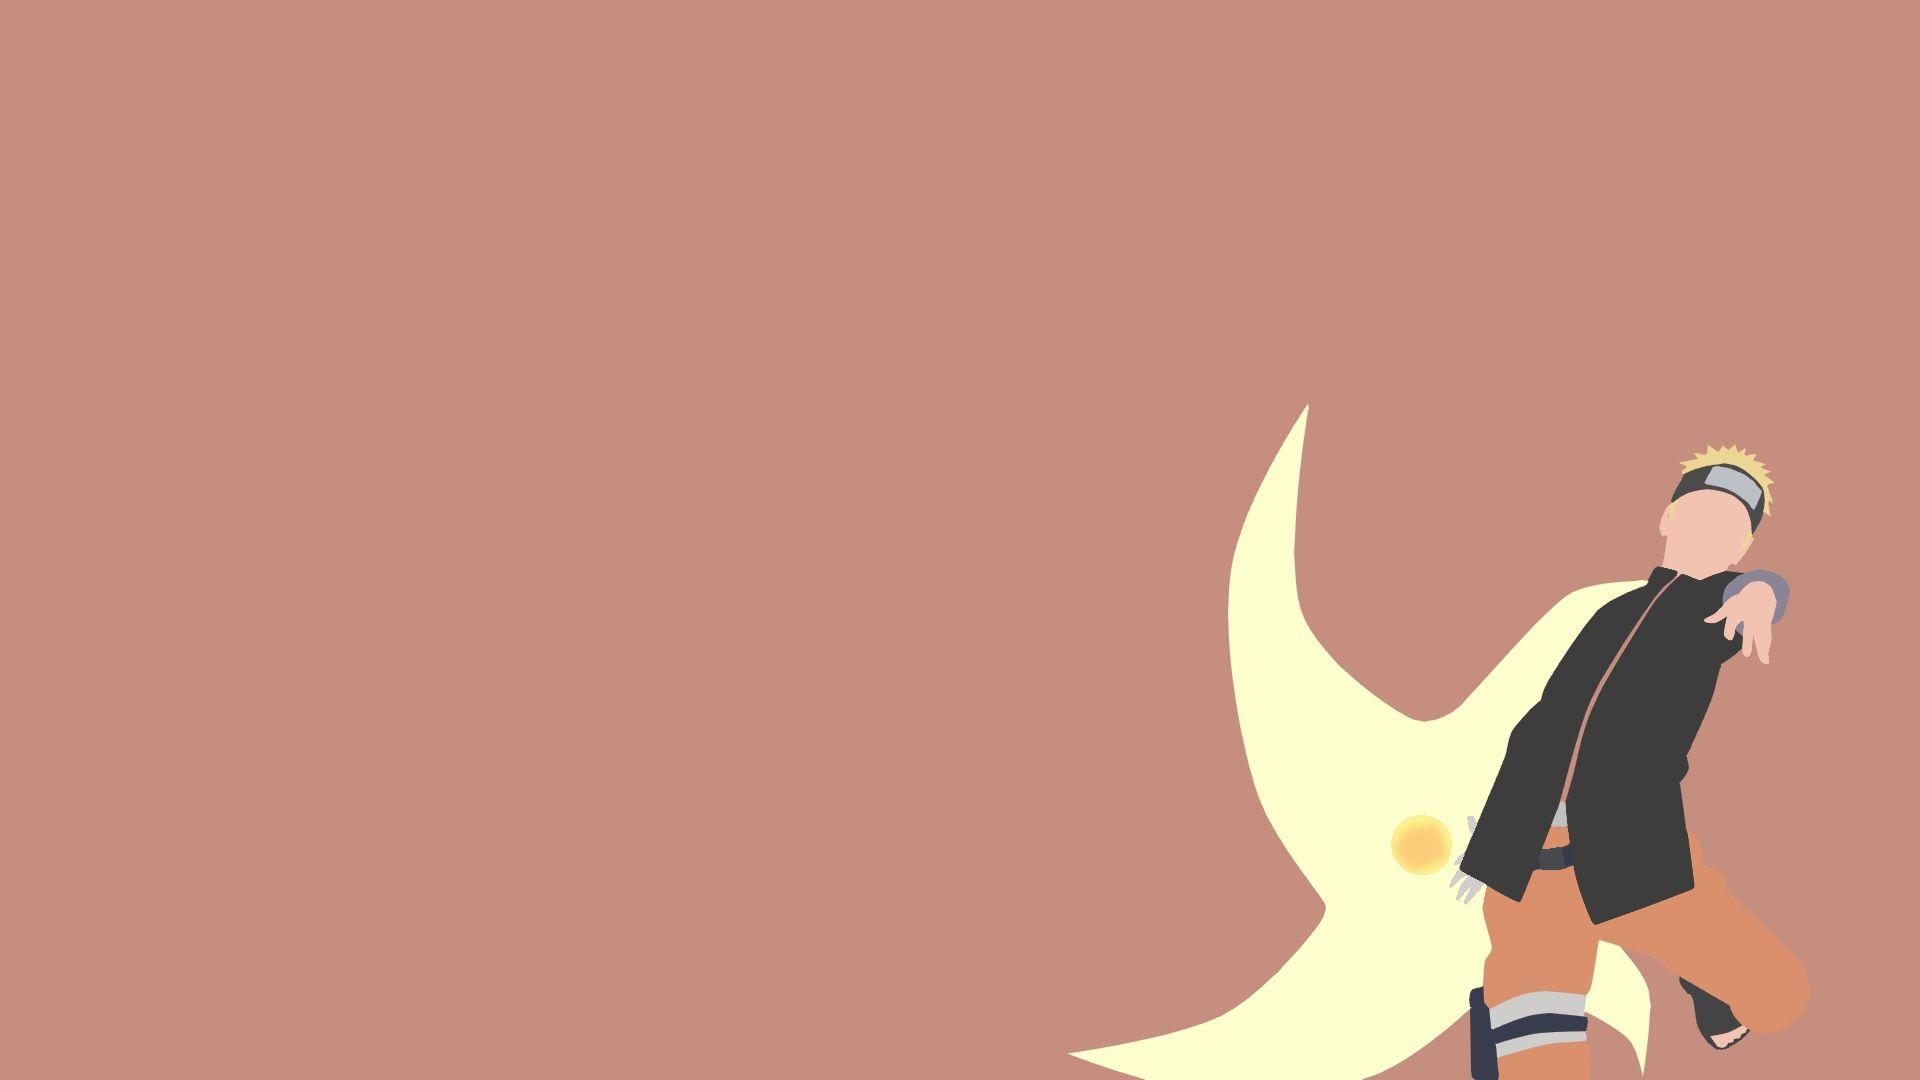 Naruto Minimalist, Background Wallpaper